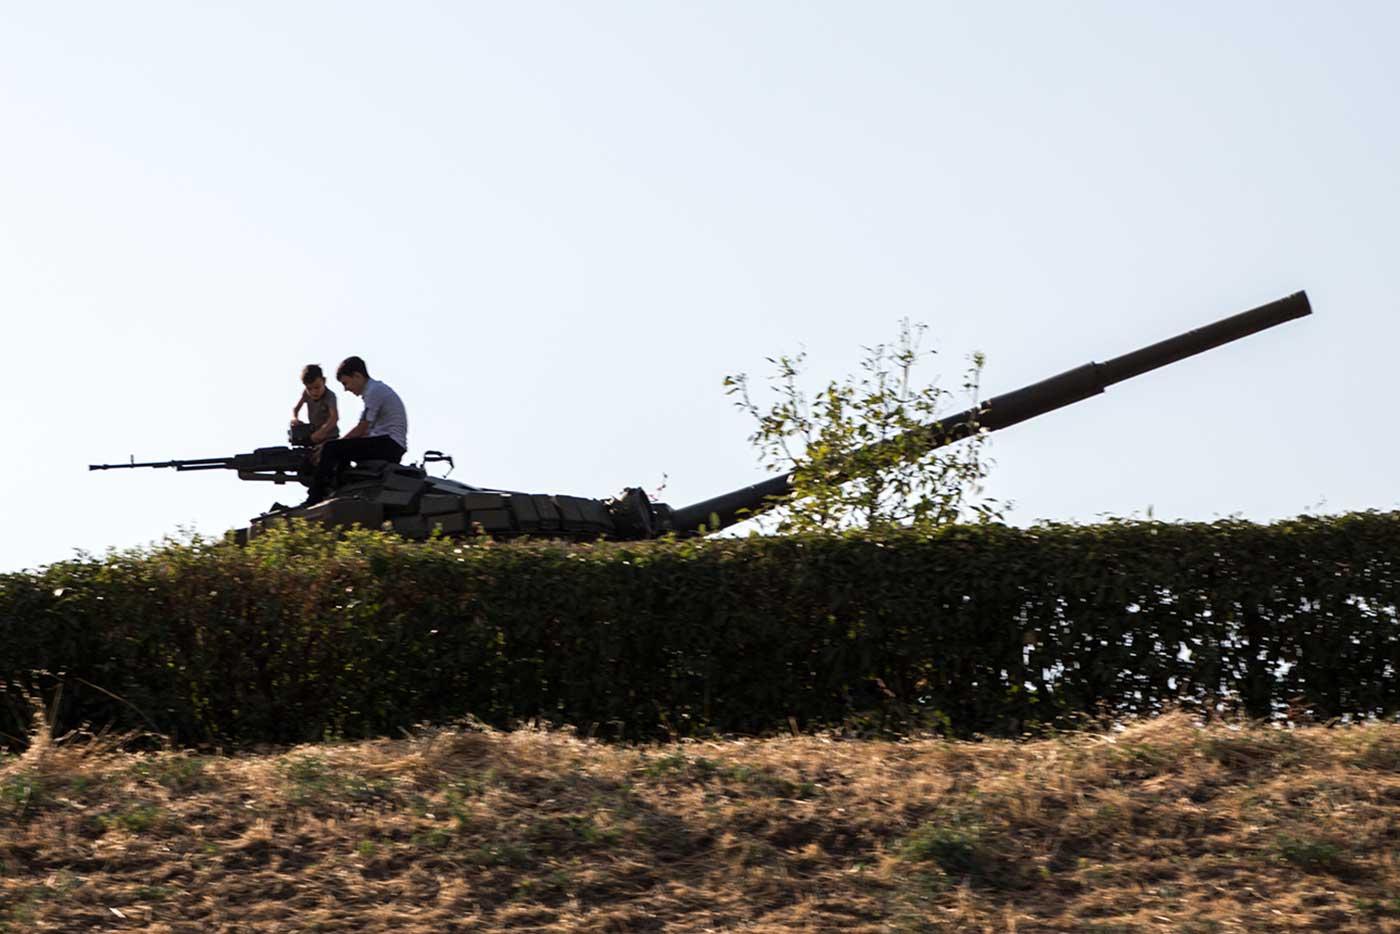 Young tourists play on a memorialised tank. Nagorno-Karabakh.